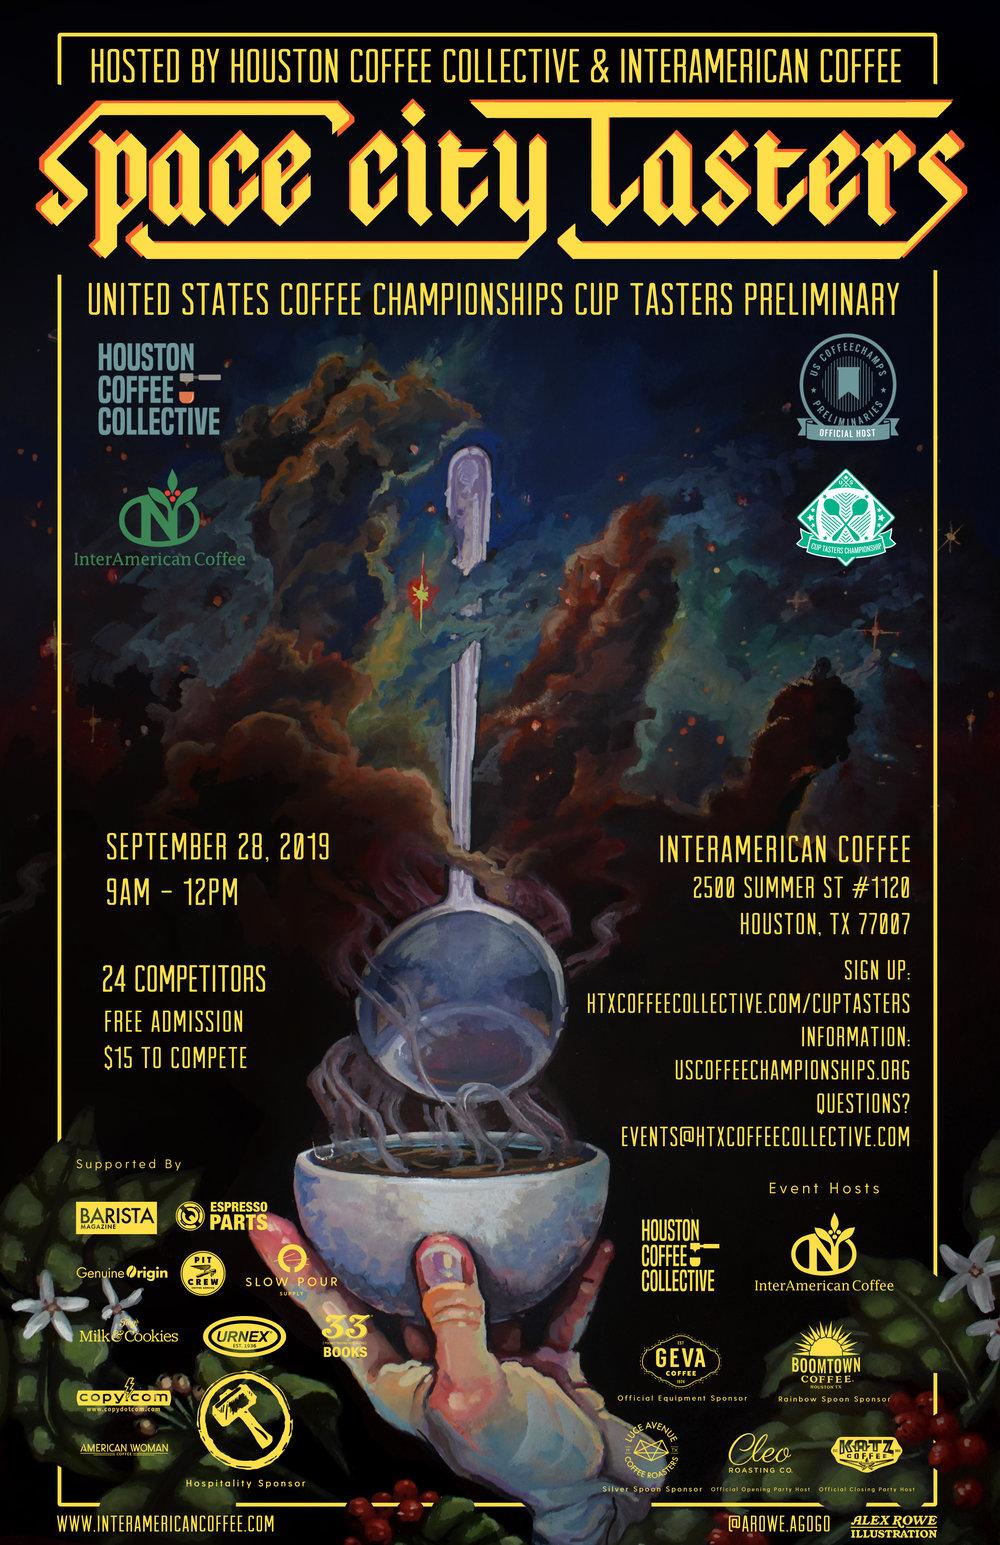 🌷 Tournament bracket 13 teams single elimination